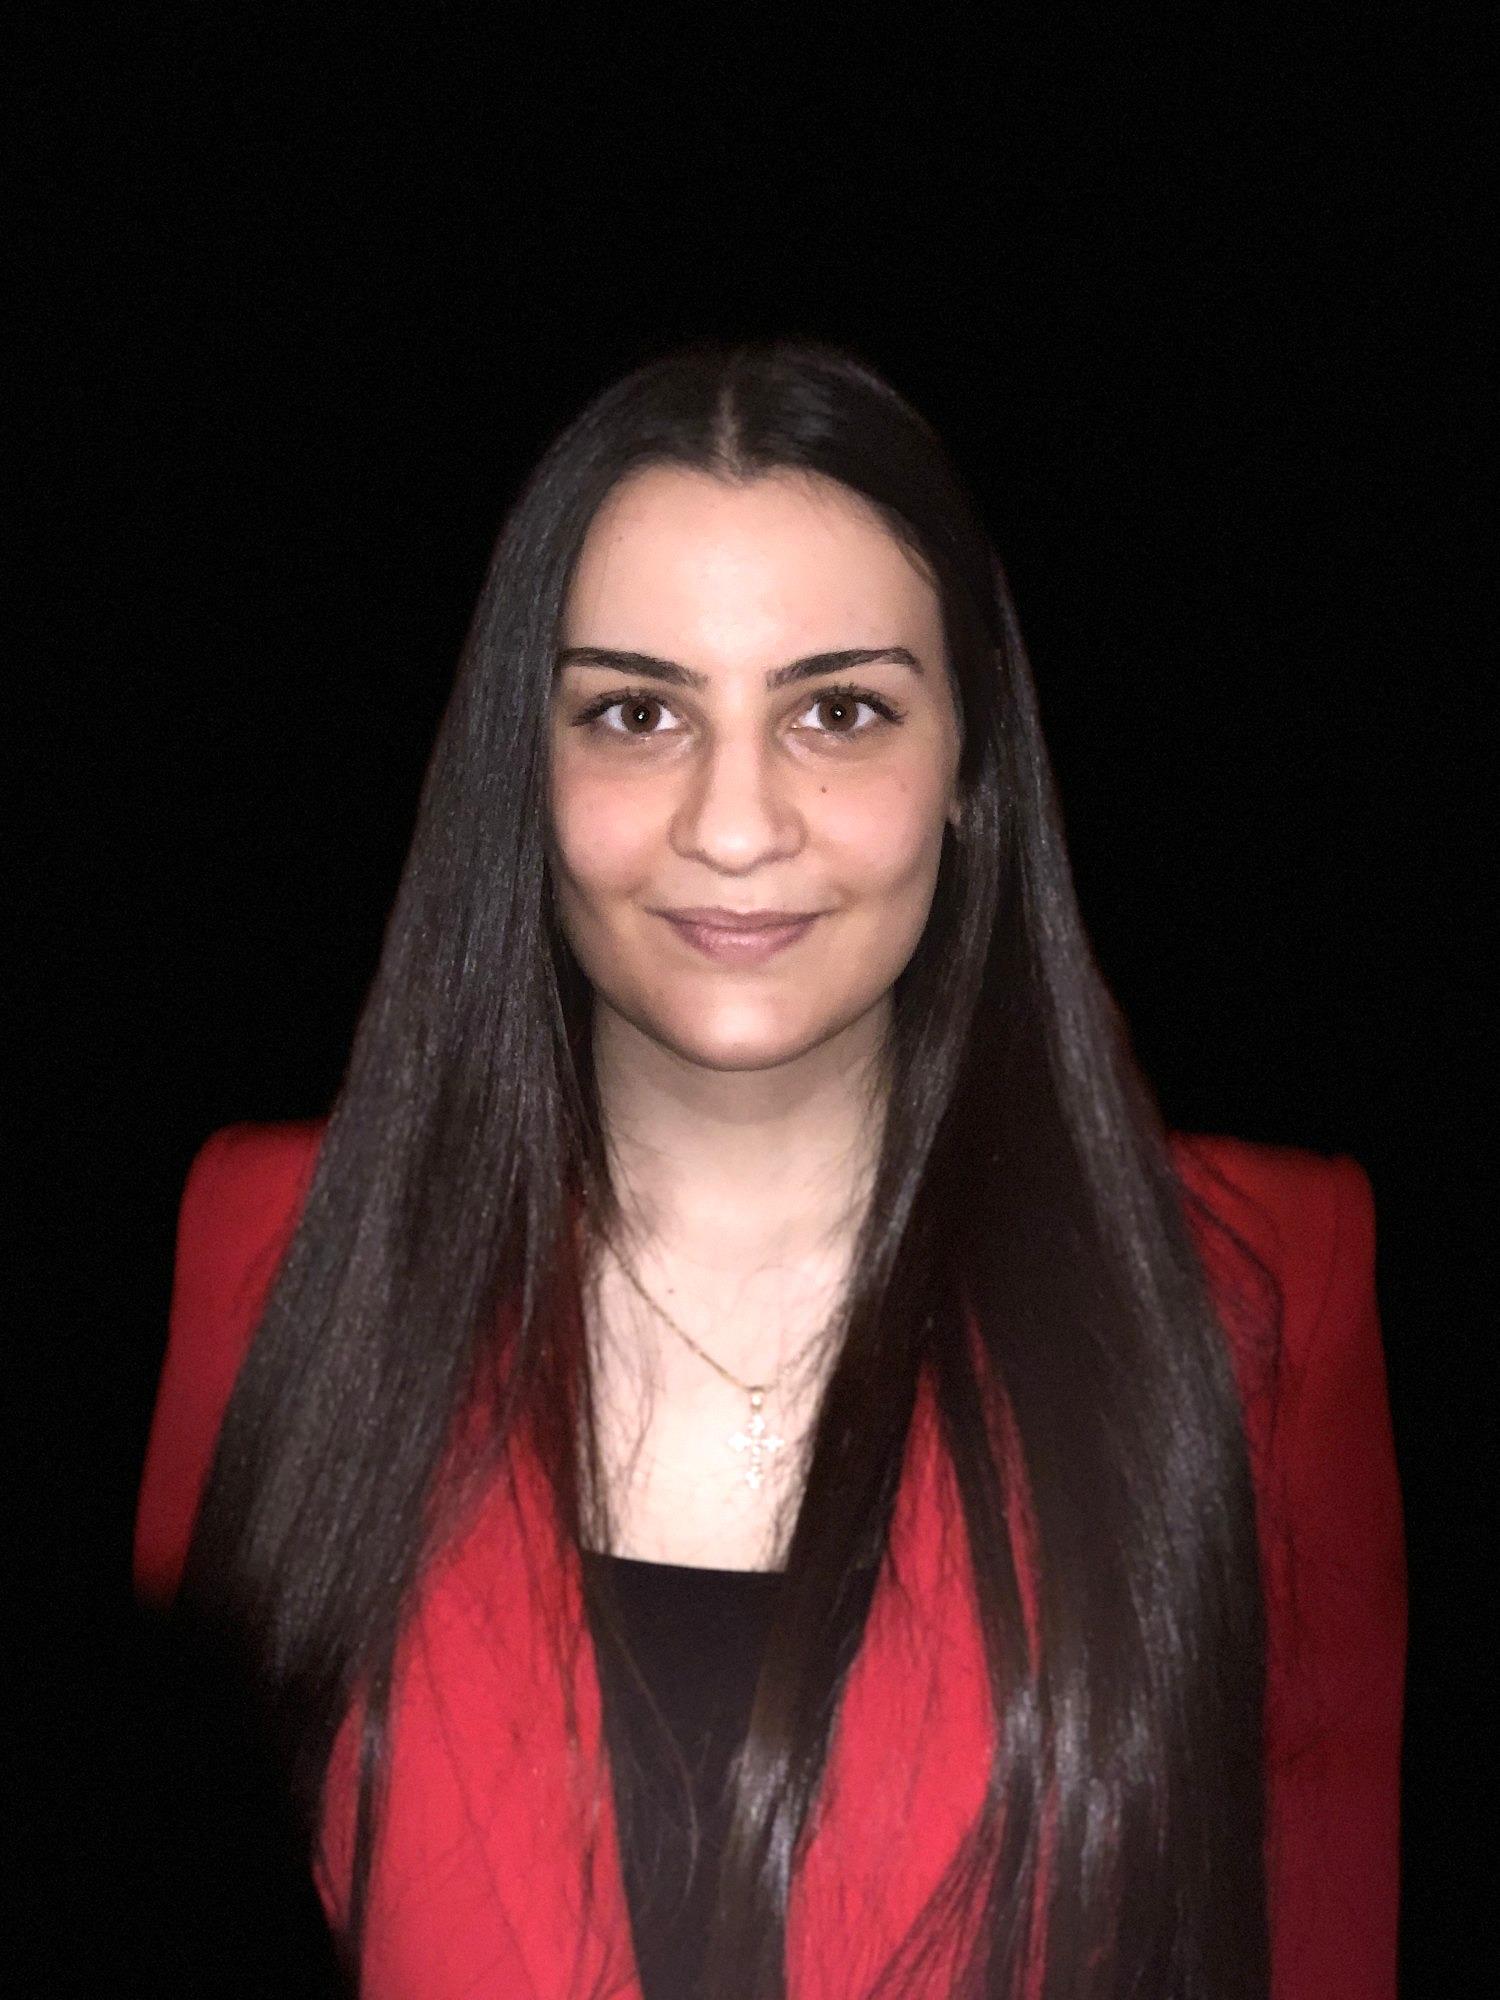 Sara Kasapoğlu